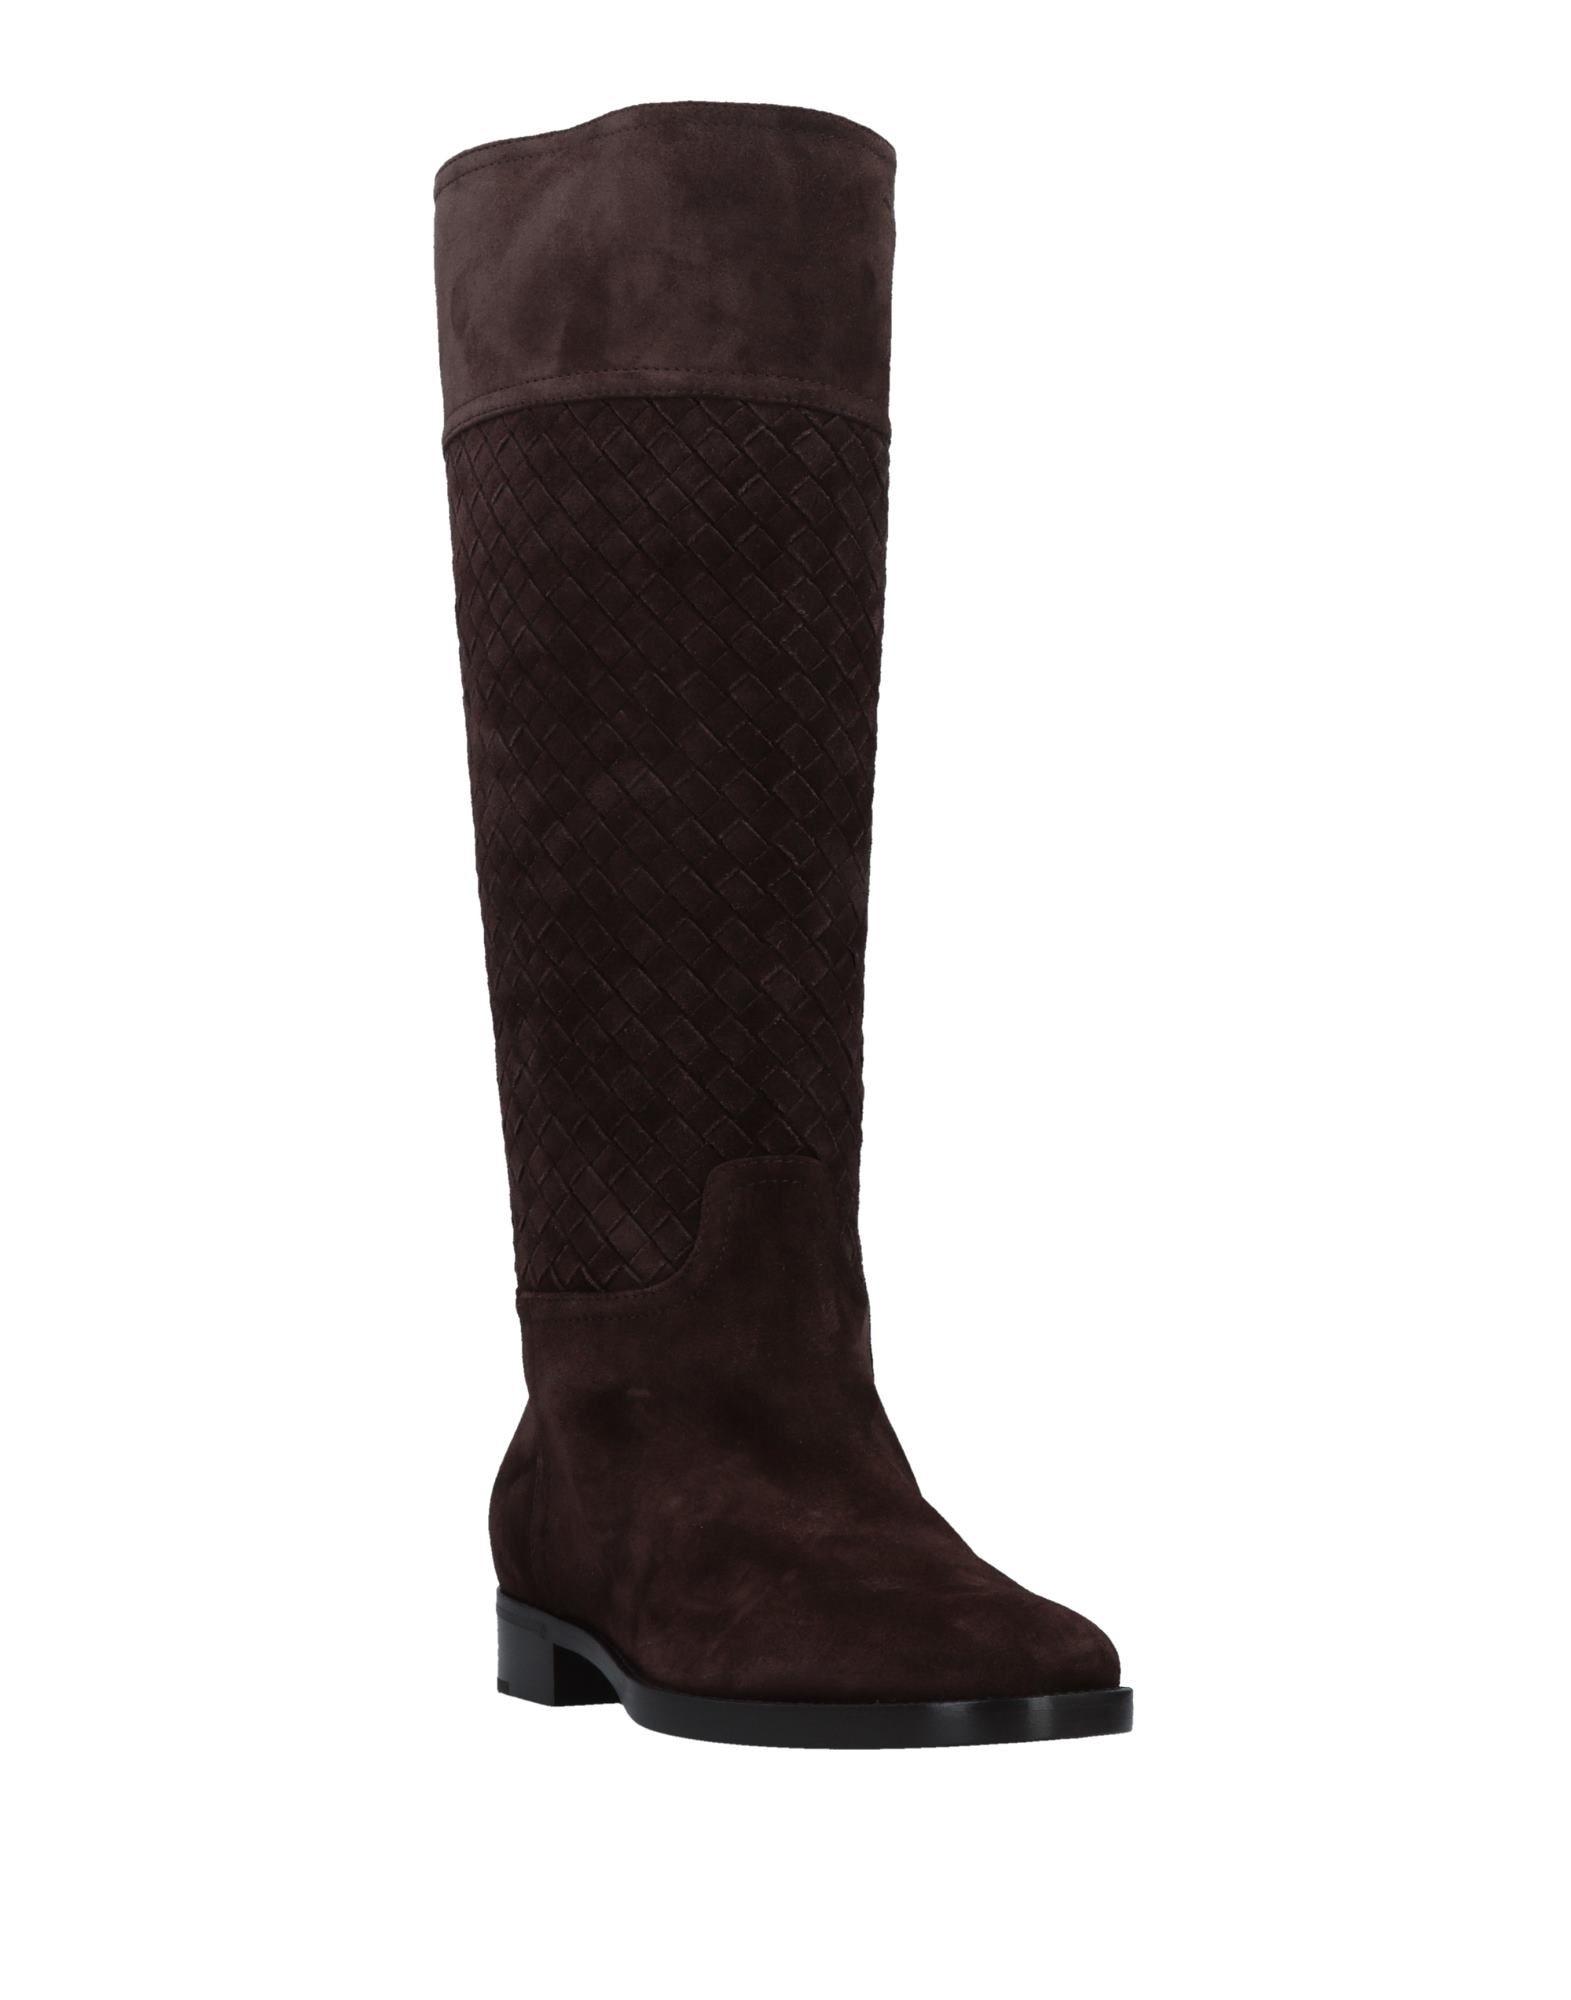 Bottega Veneta Stiefel Damen  11509513DXGünstige gut aussehende Schuhe